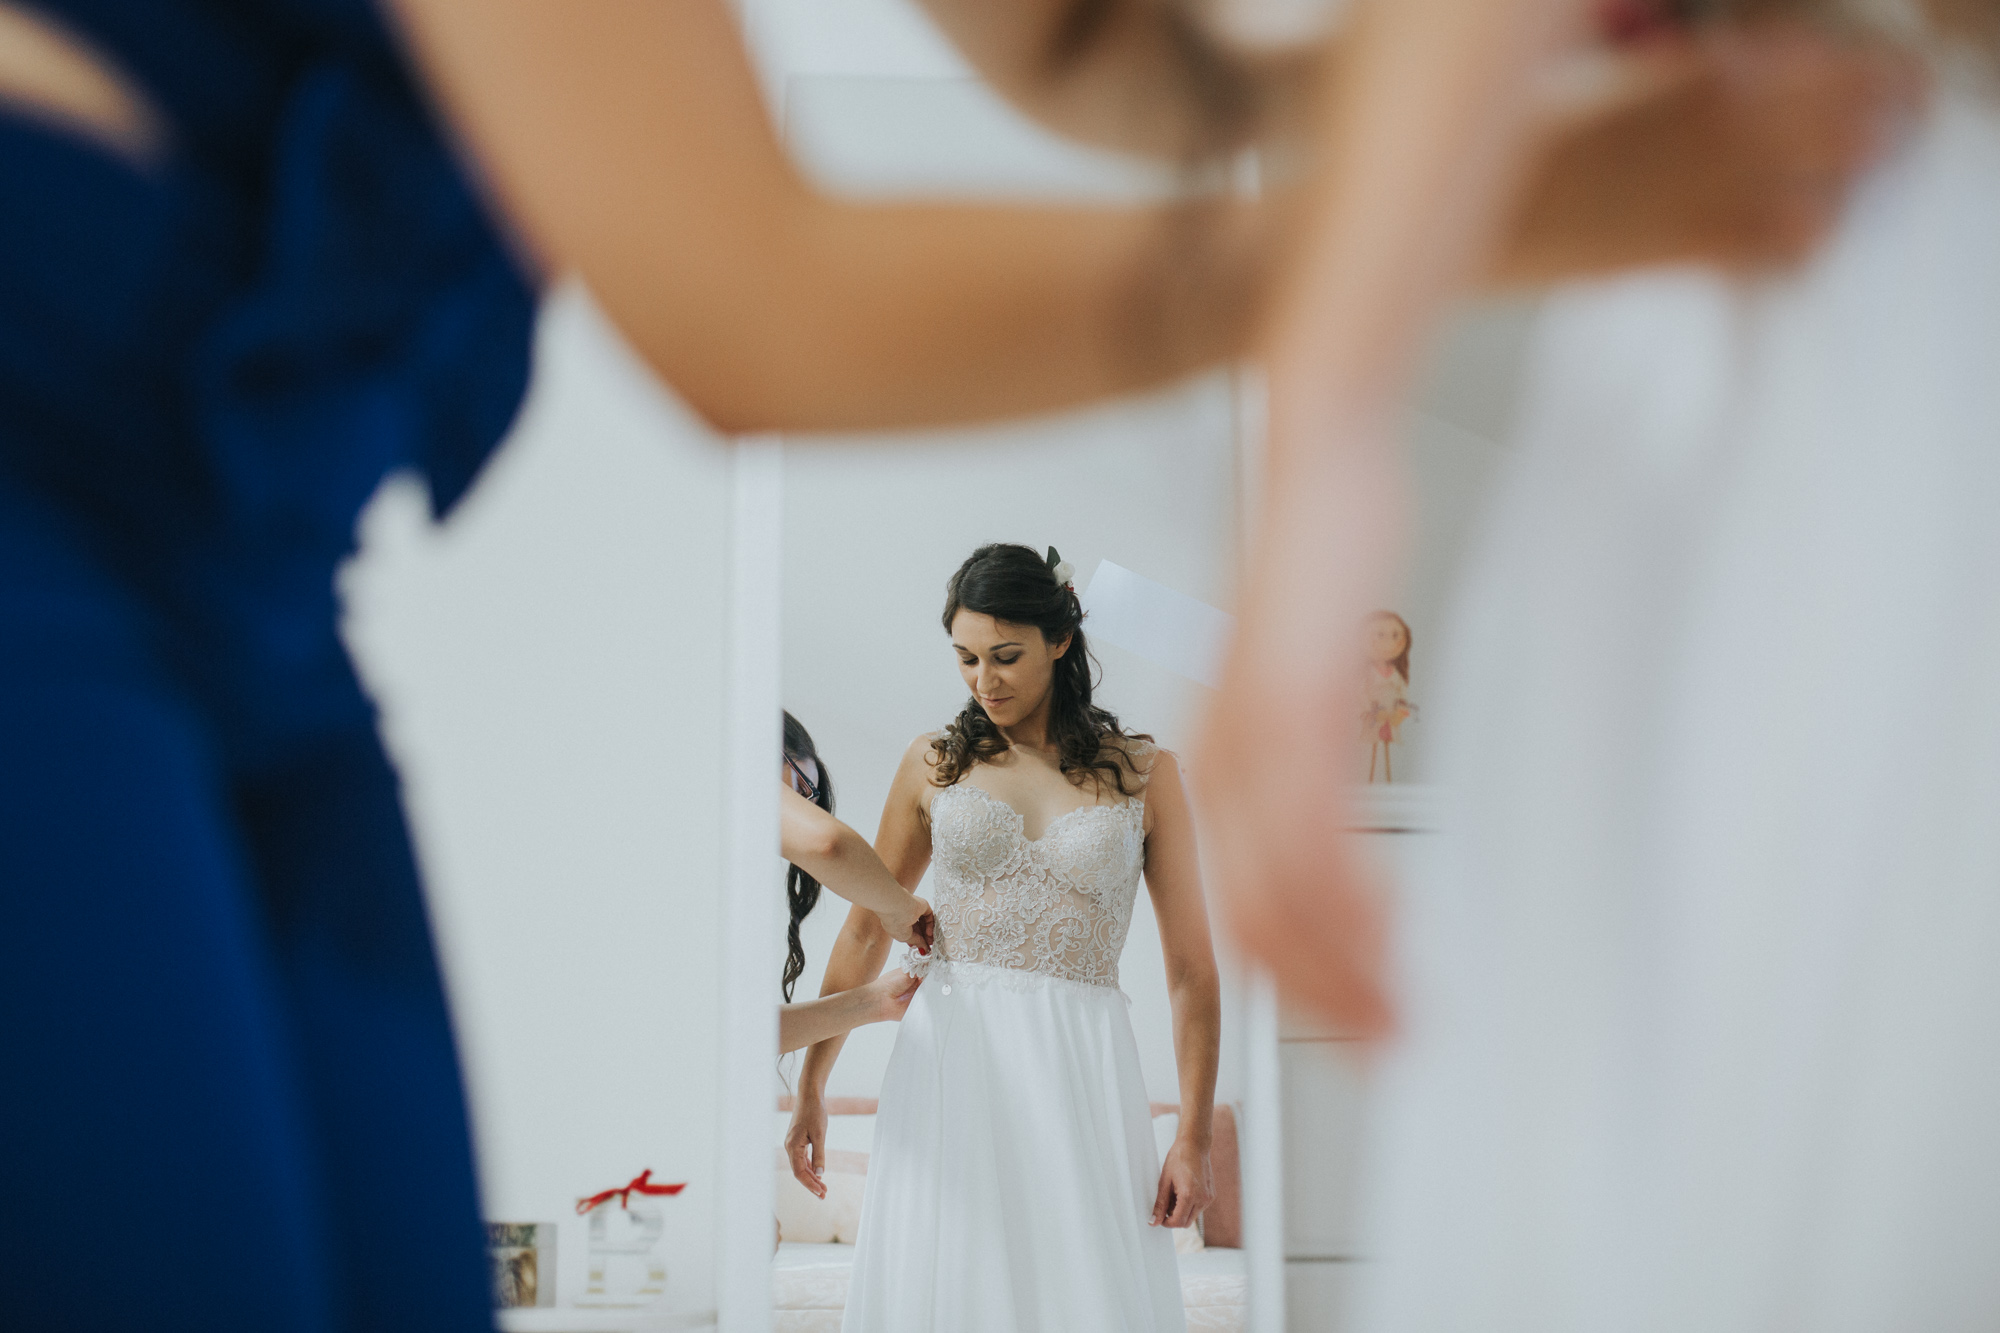 078-carina-e-samuel-wedding-casamento-quinta-dos-rouxinois-rustico-my-fancy-wedding-mafra-malveira-lisboa-sintra-cascais-filipe-santiago-fotografia-fotografo-lifestyle-destination-portugal